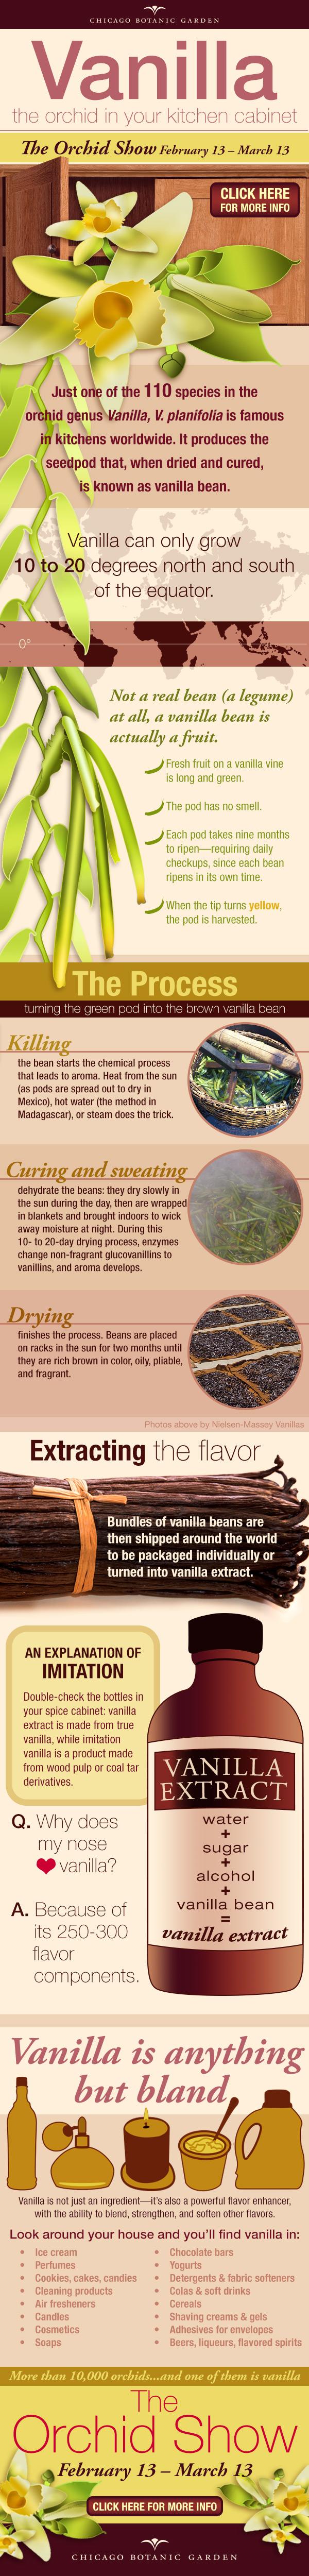 ILLUSTRATION: Vanilla infographic.